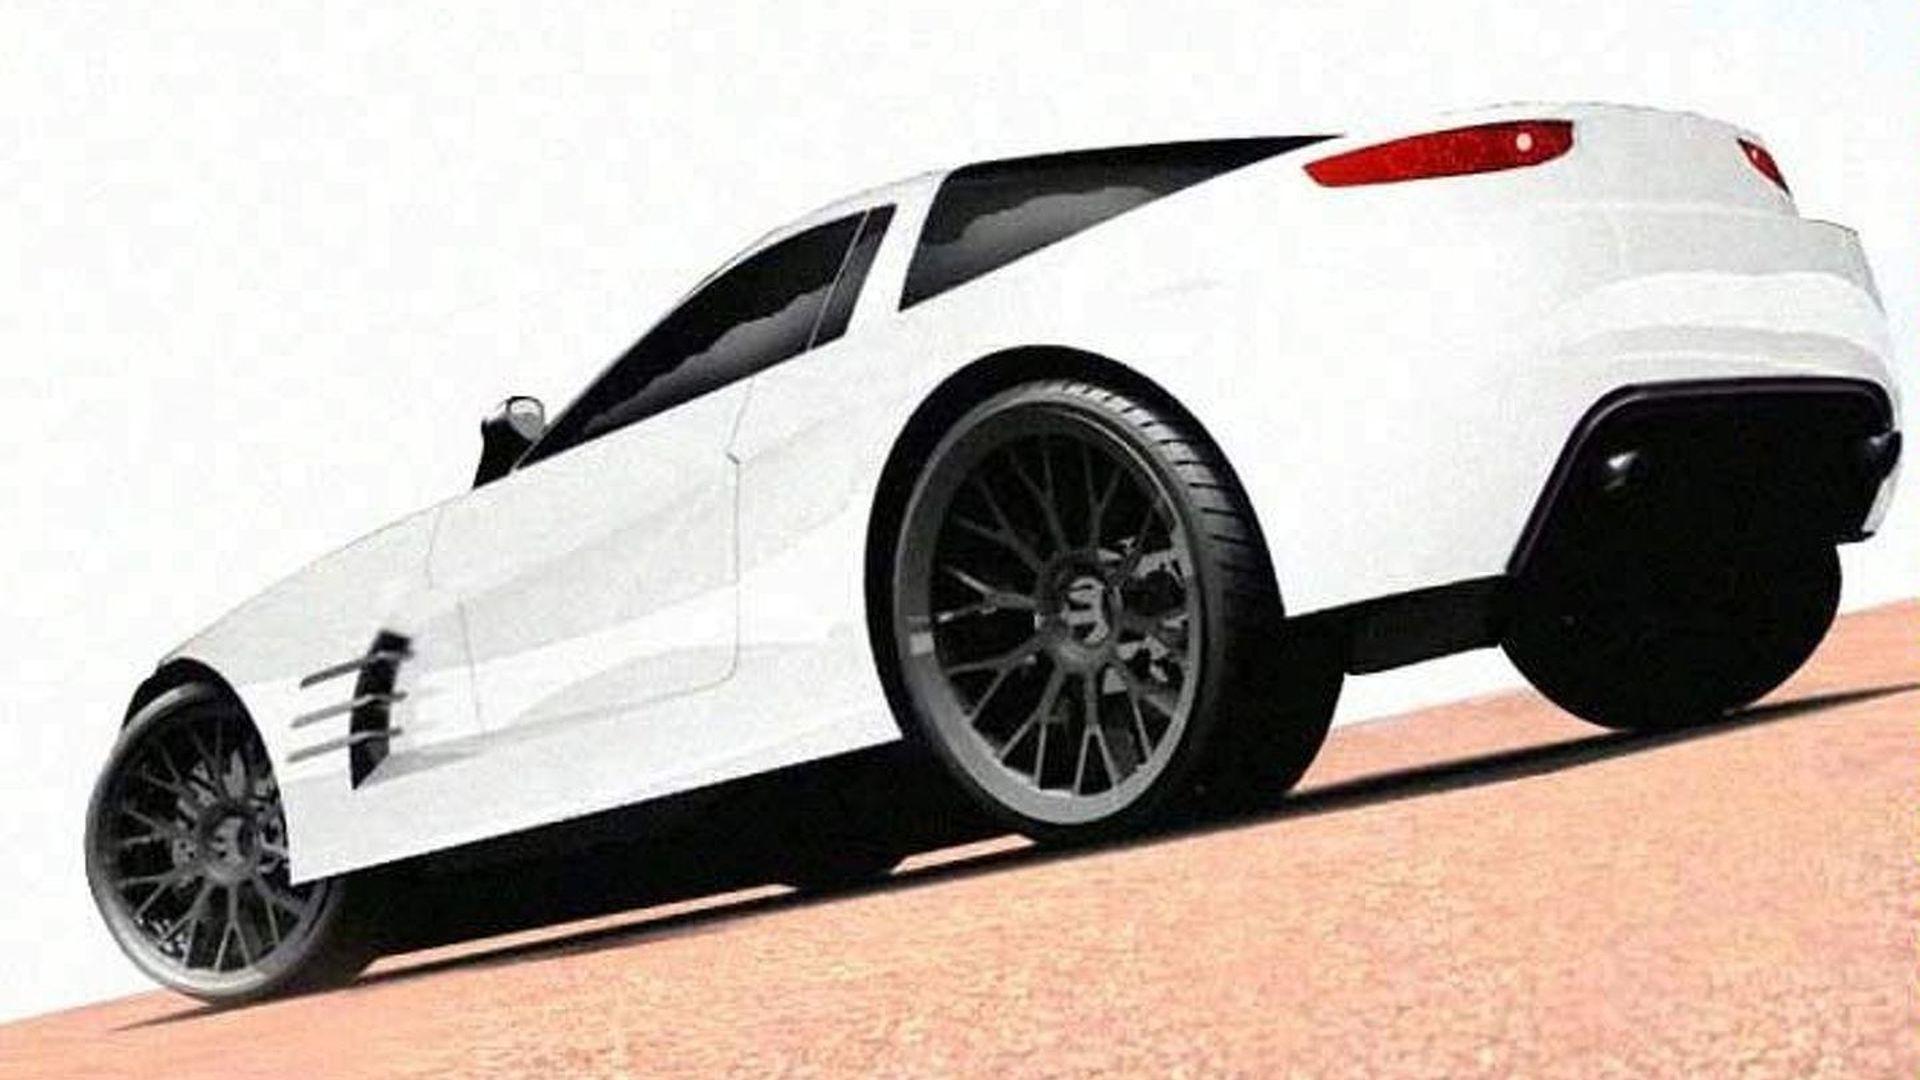 Phoenix GT/Uirapuru, the 800 hp Brazilian Sports Car